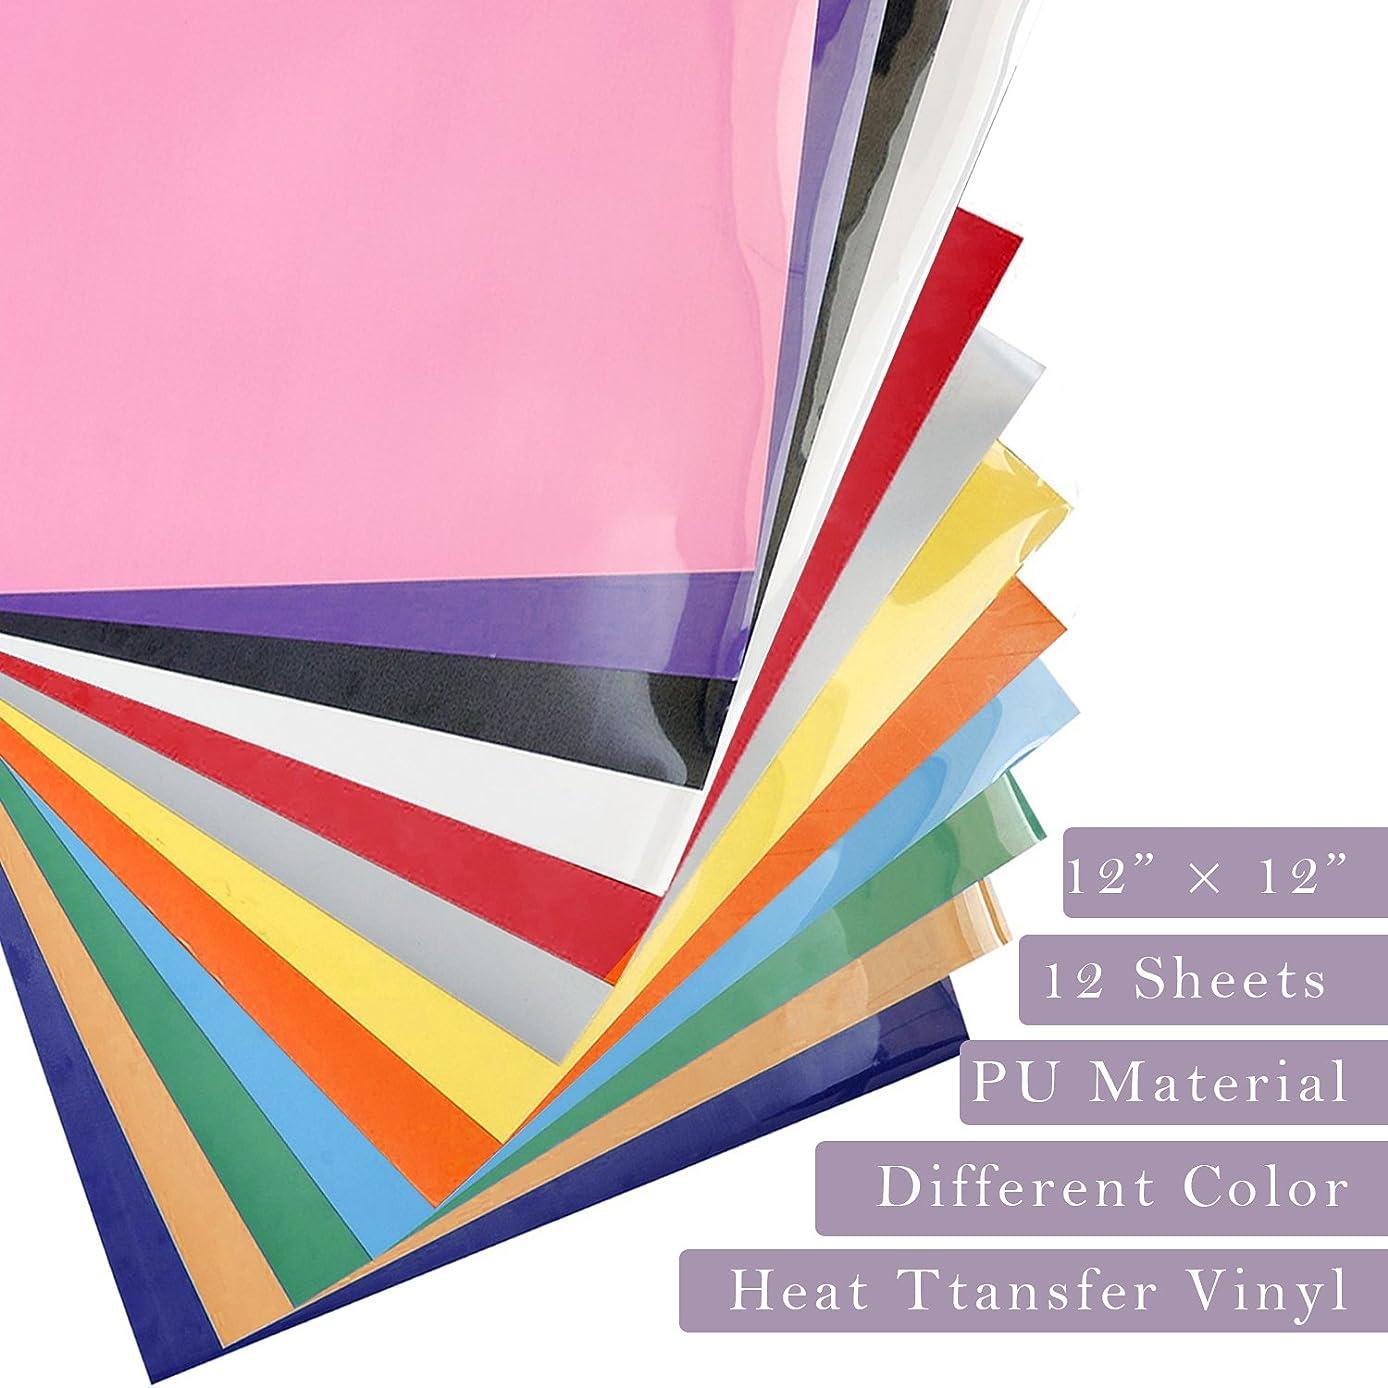 Unime Heat Transfer Vinyl 12